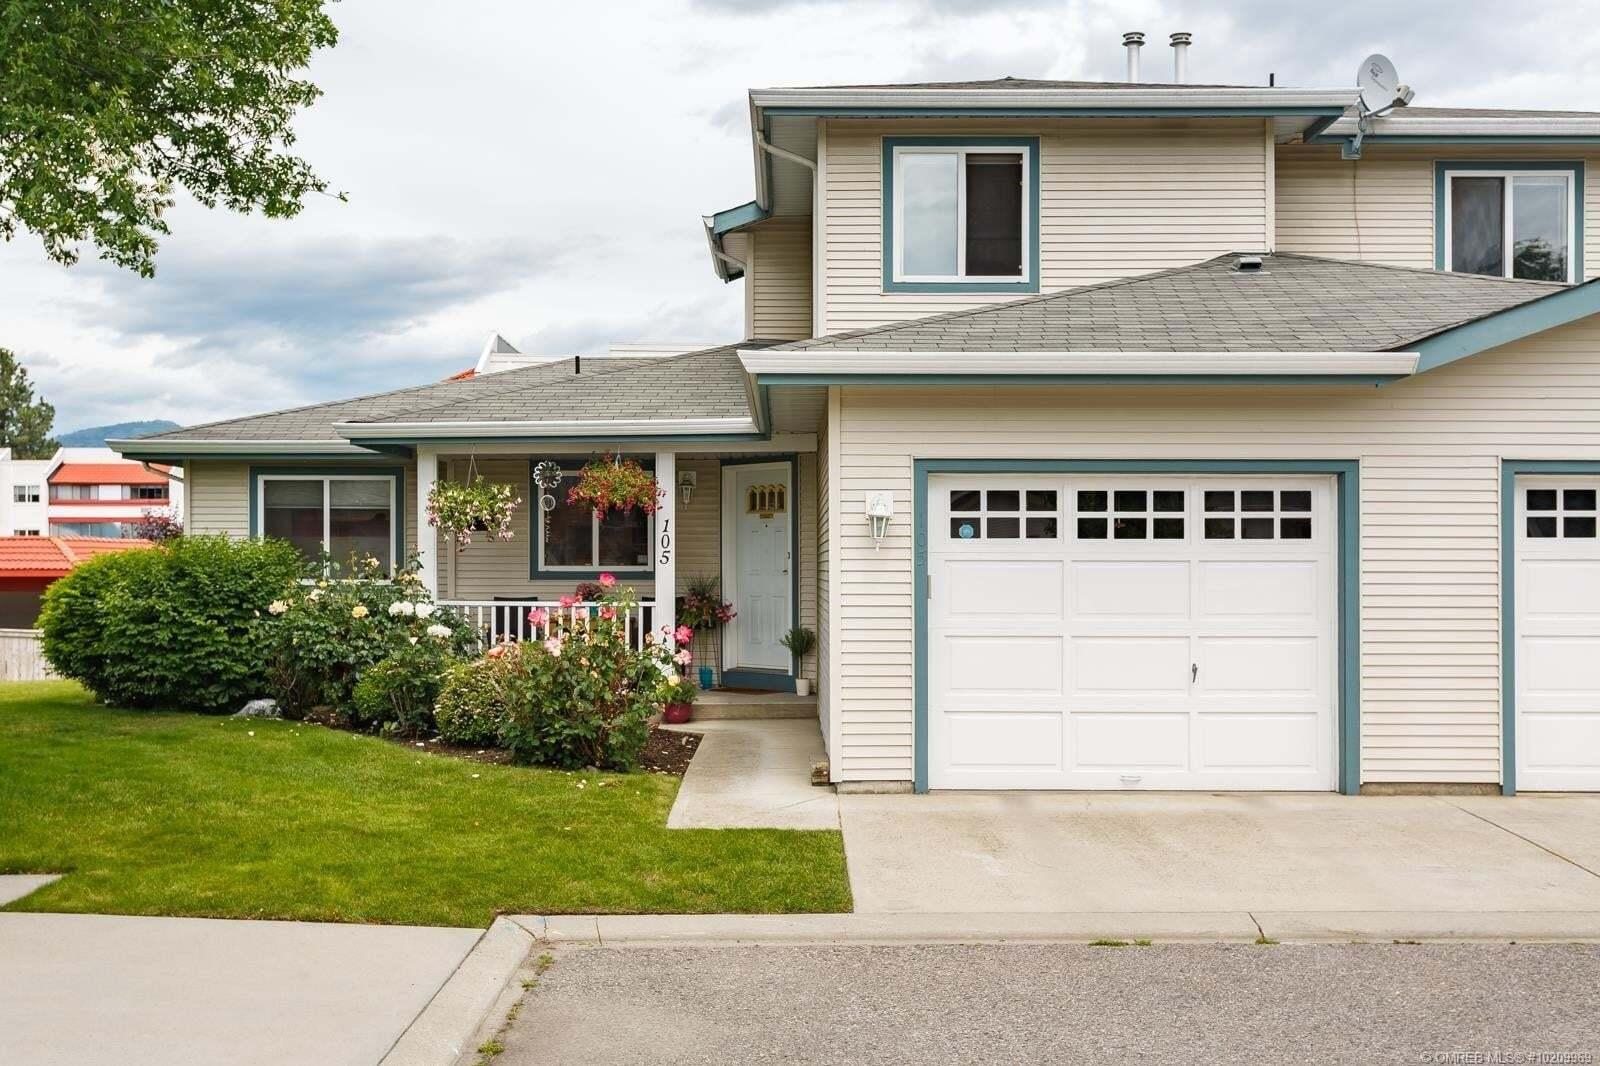 Townhouse for sale at 1120 Guisachan Rd Kelowna British Columbia - MLS: 10209969